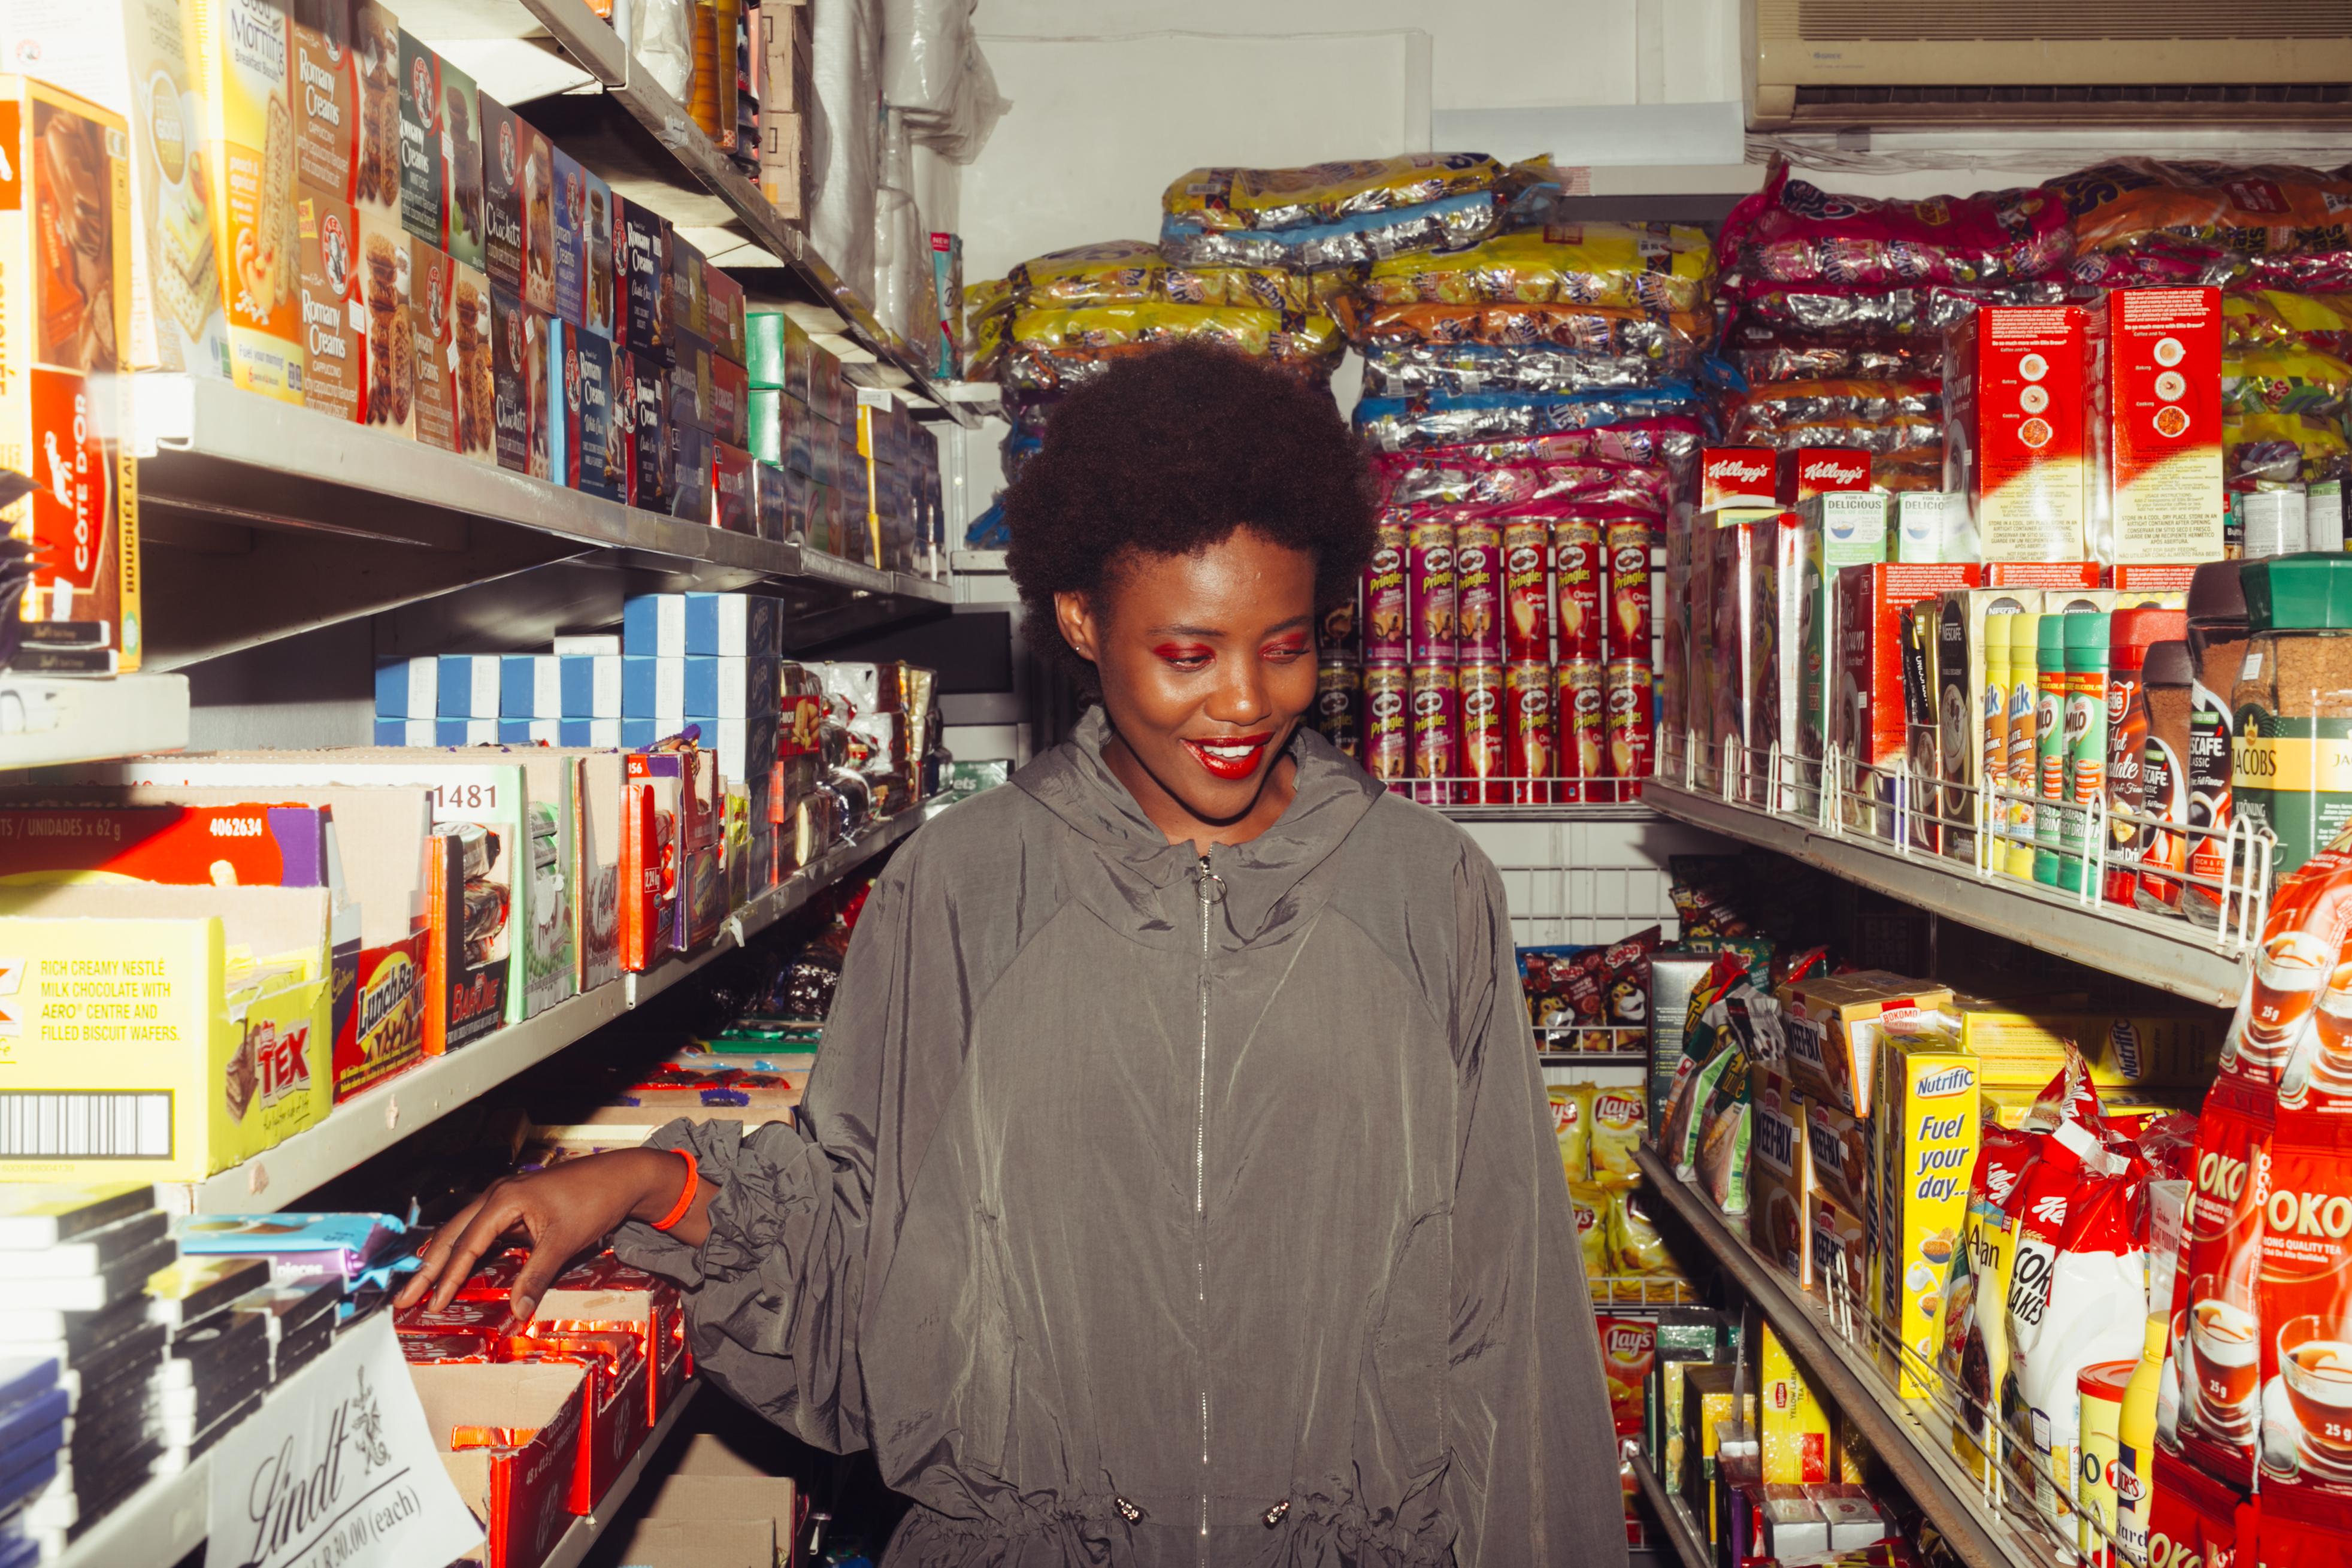 ethnic woman choosing food in supermarket